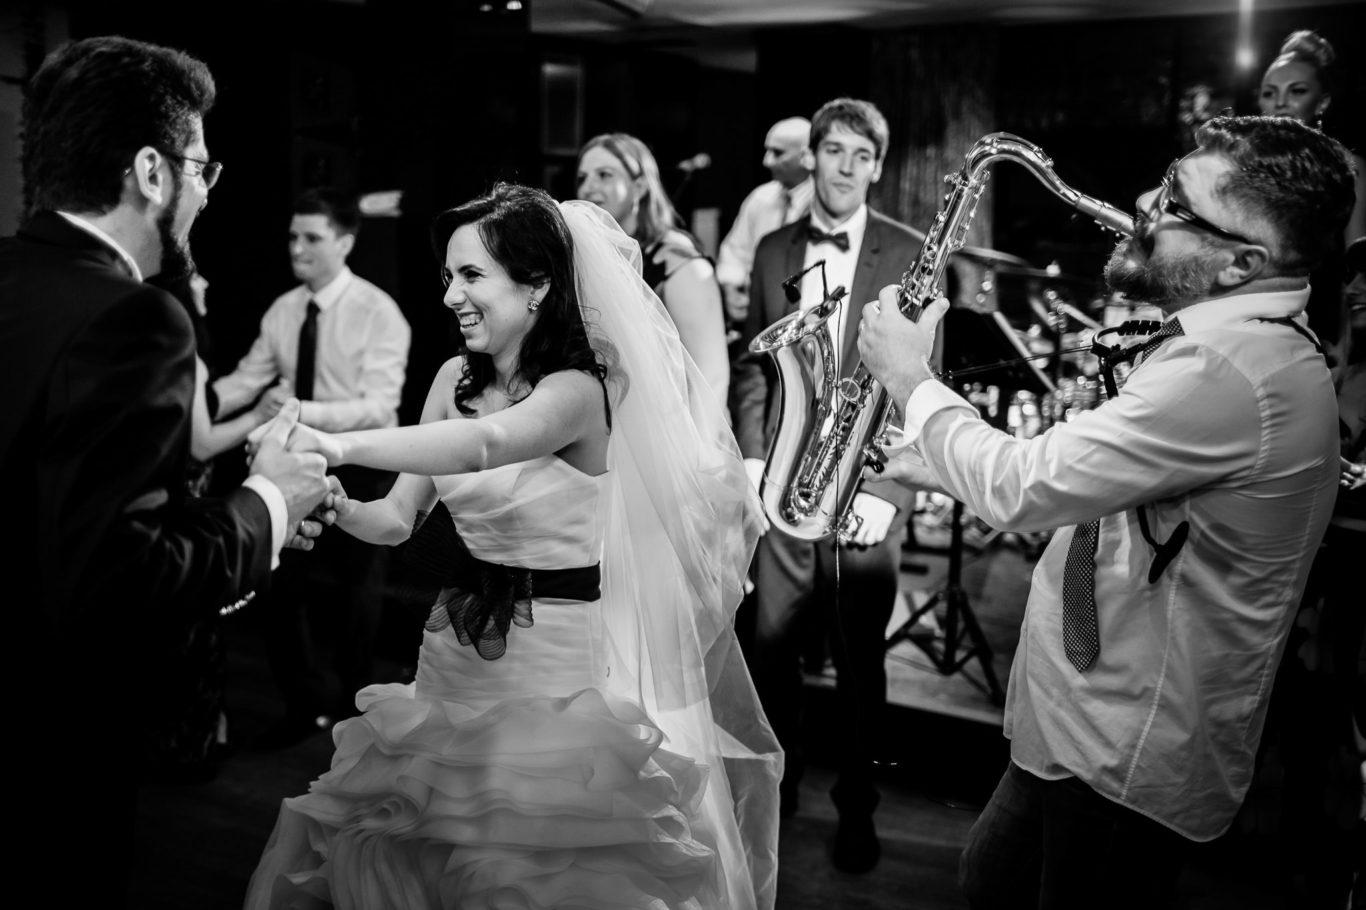 0835-Fotografie-nunta-Simona-Valentin-fotograf-Ciprian-Dumitrescu-CDF_0850 (2)